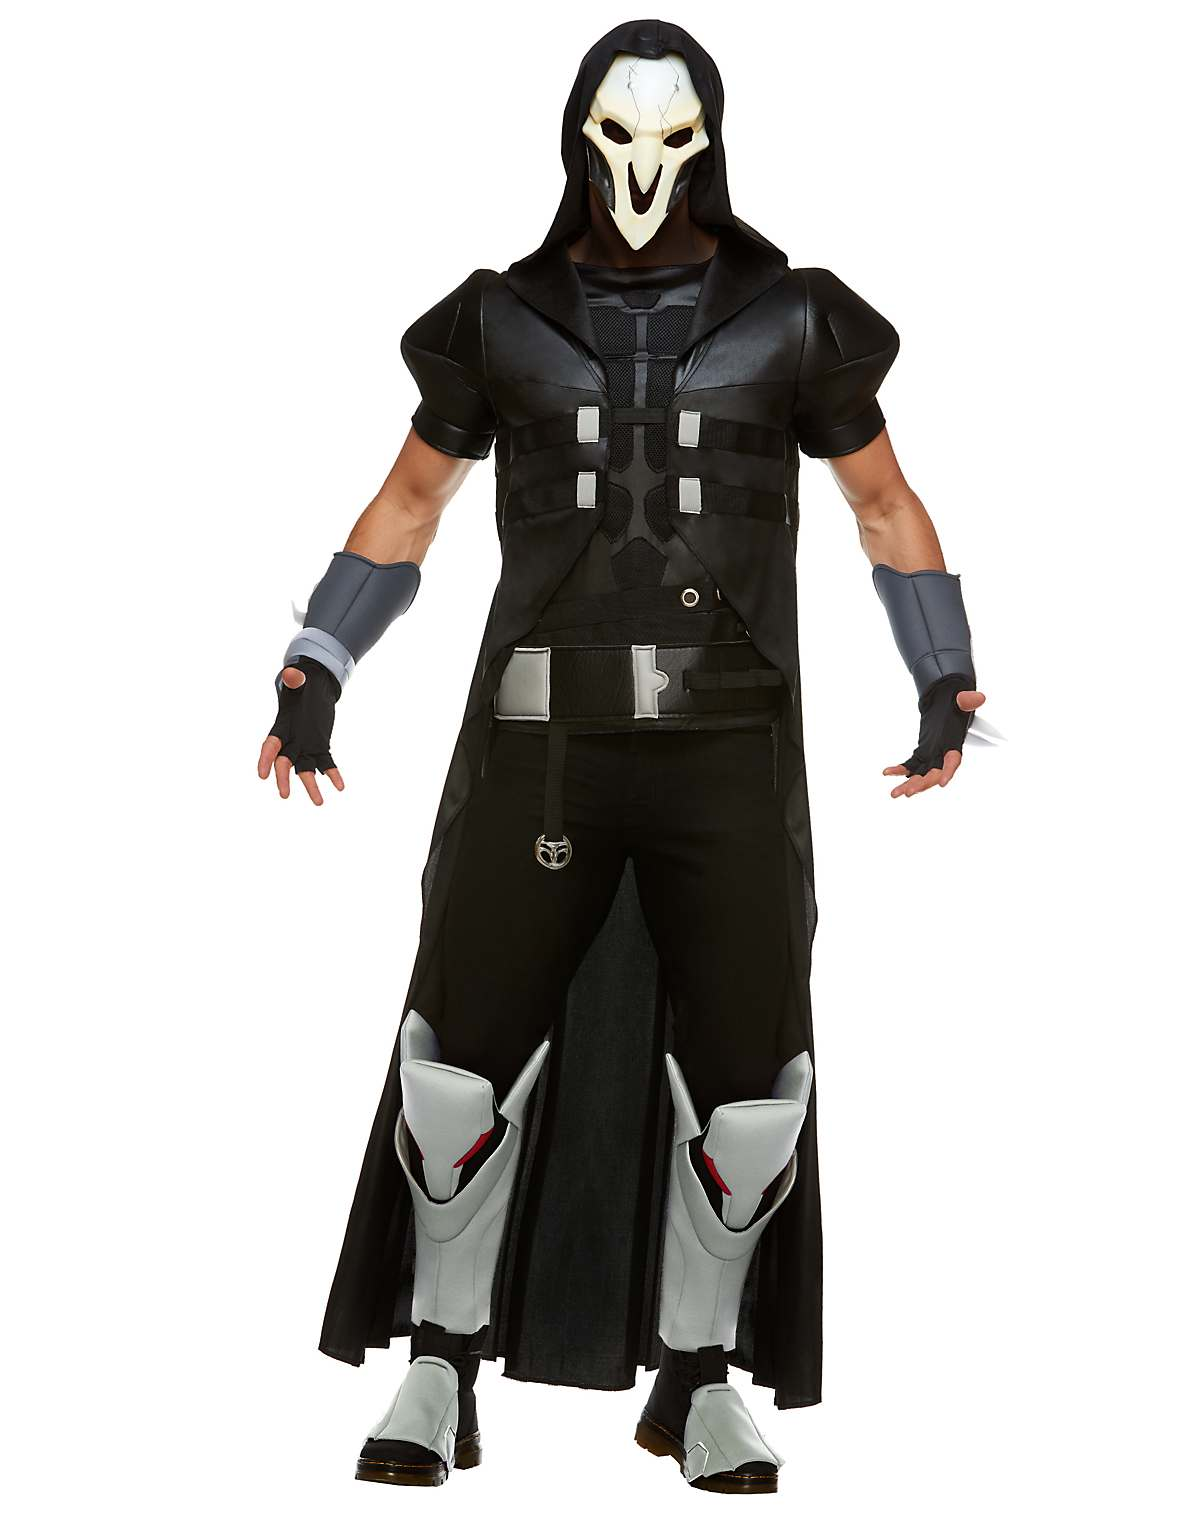 Reaper Costumes | Overwatch Costumes